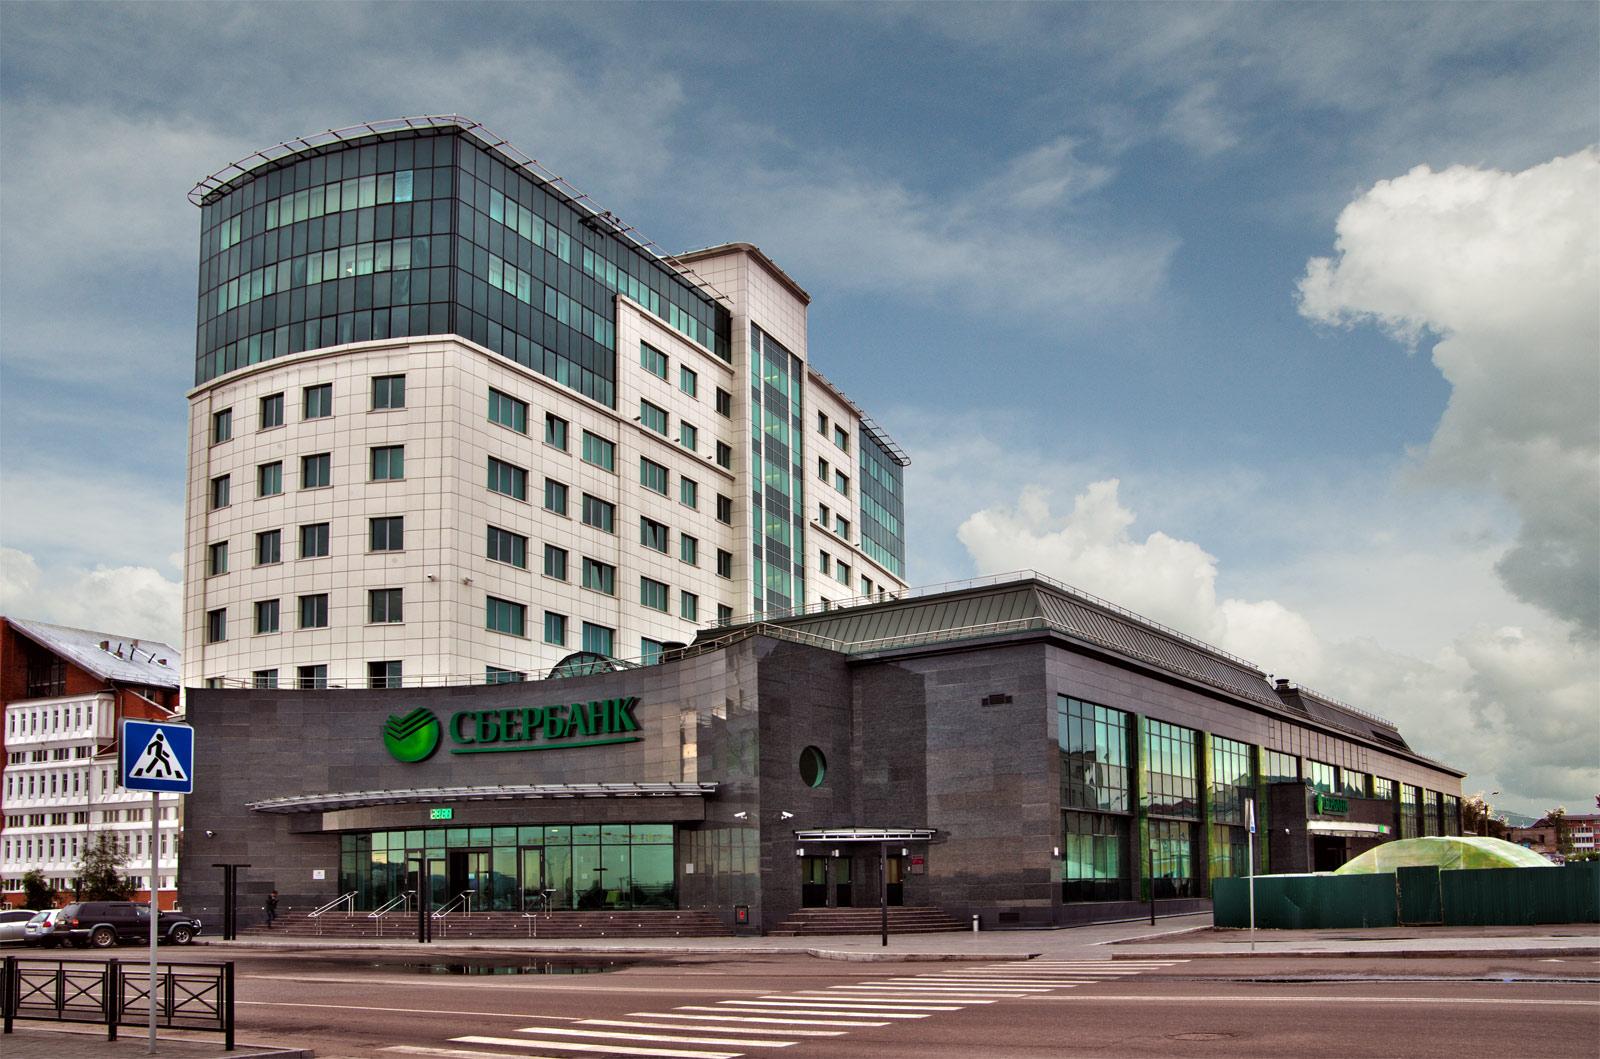 Сбербанк на ул.сухэ-батора в иркутске